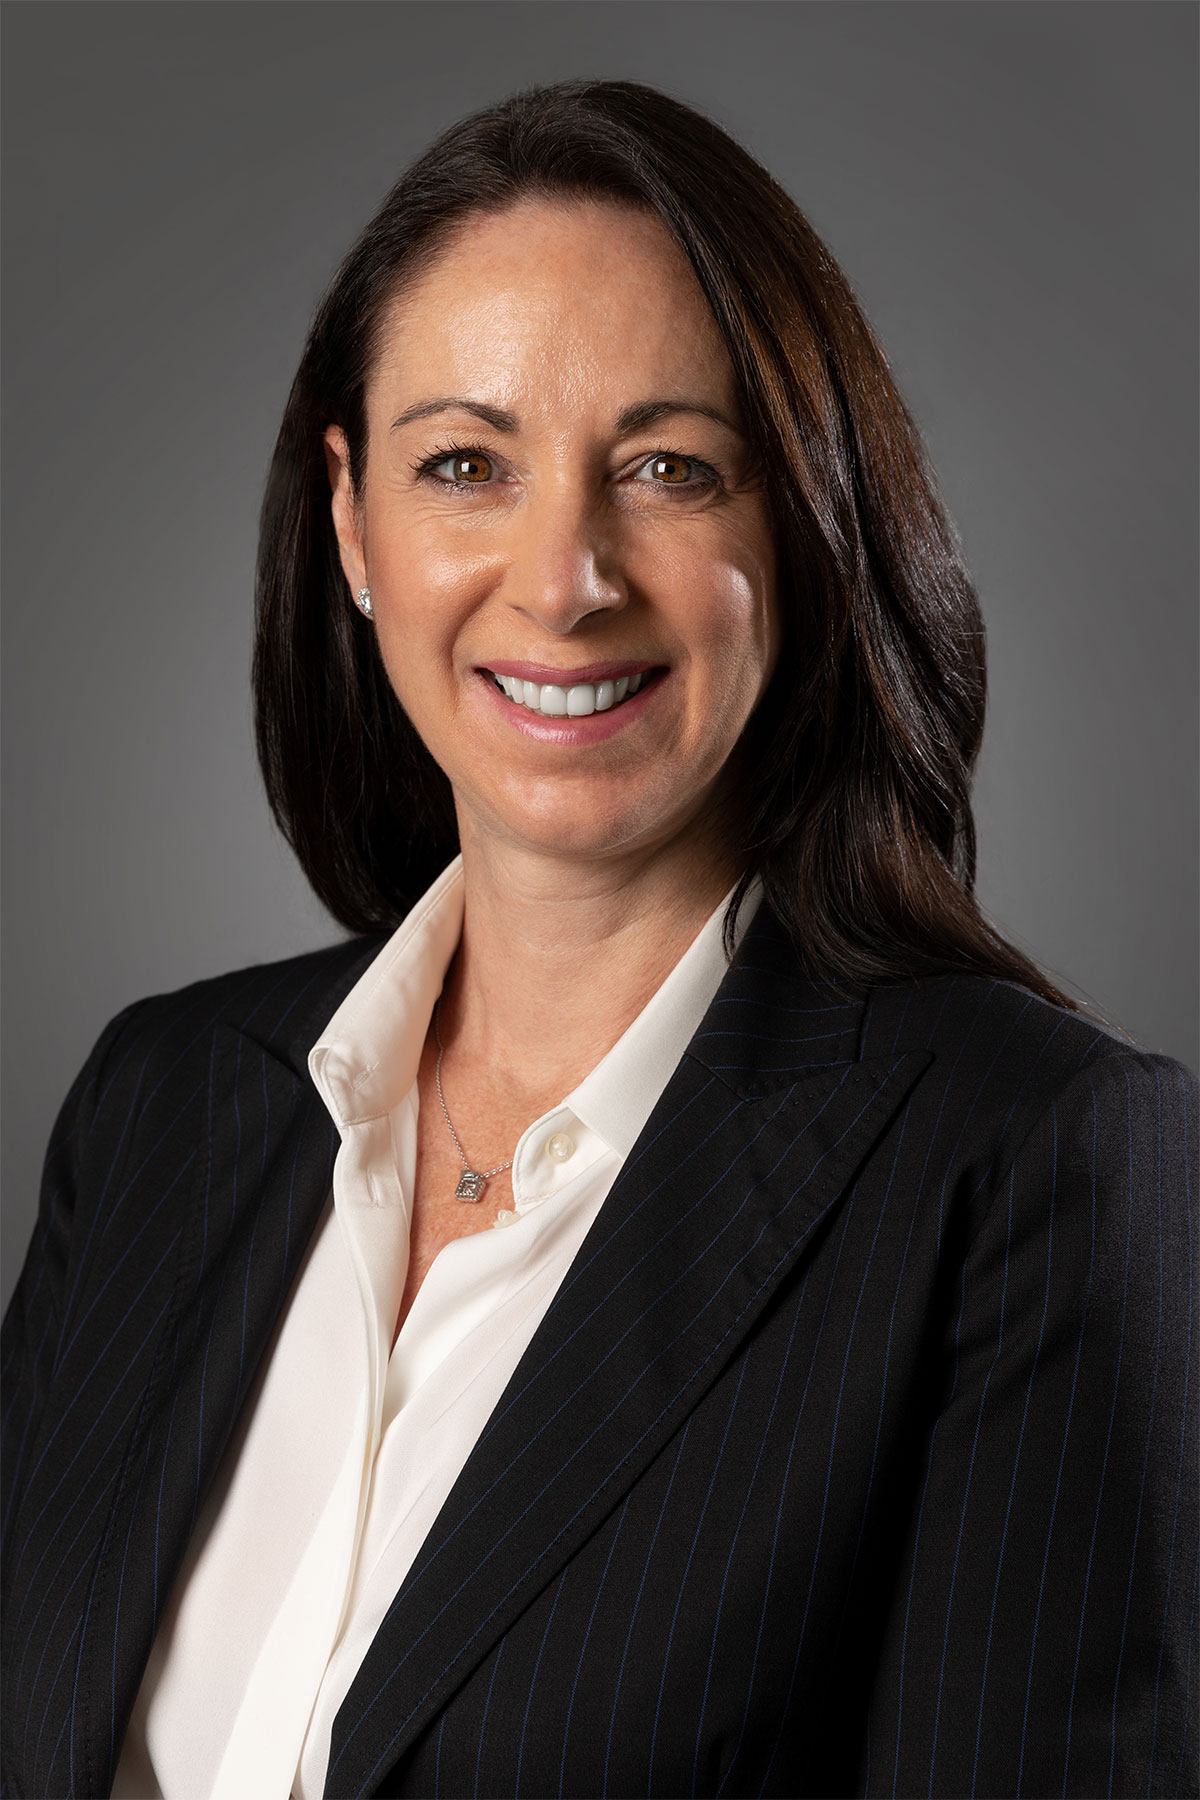 Durham College Board of Governor Lisa Allen.